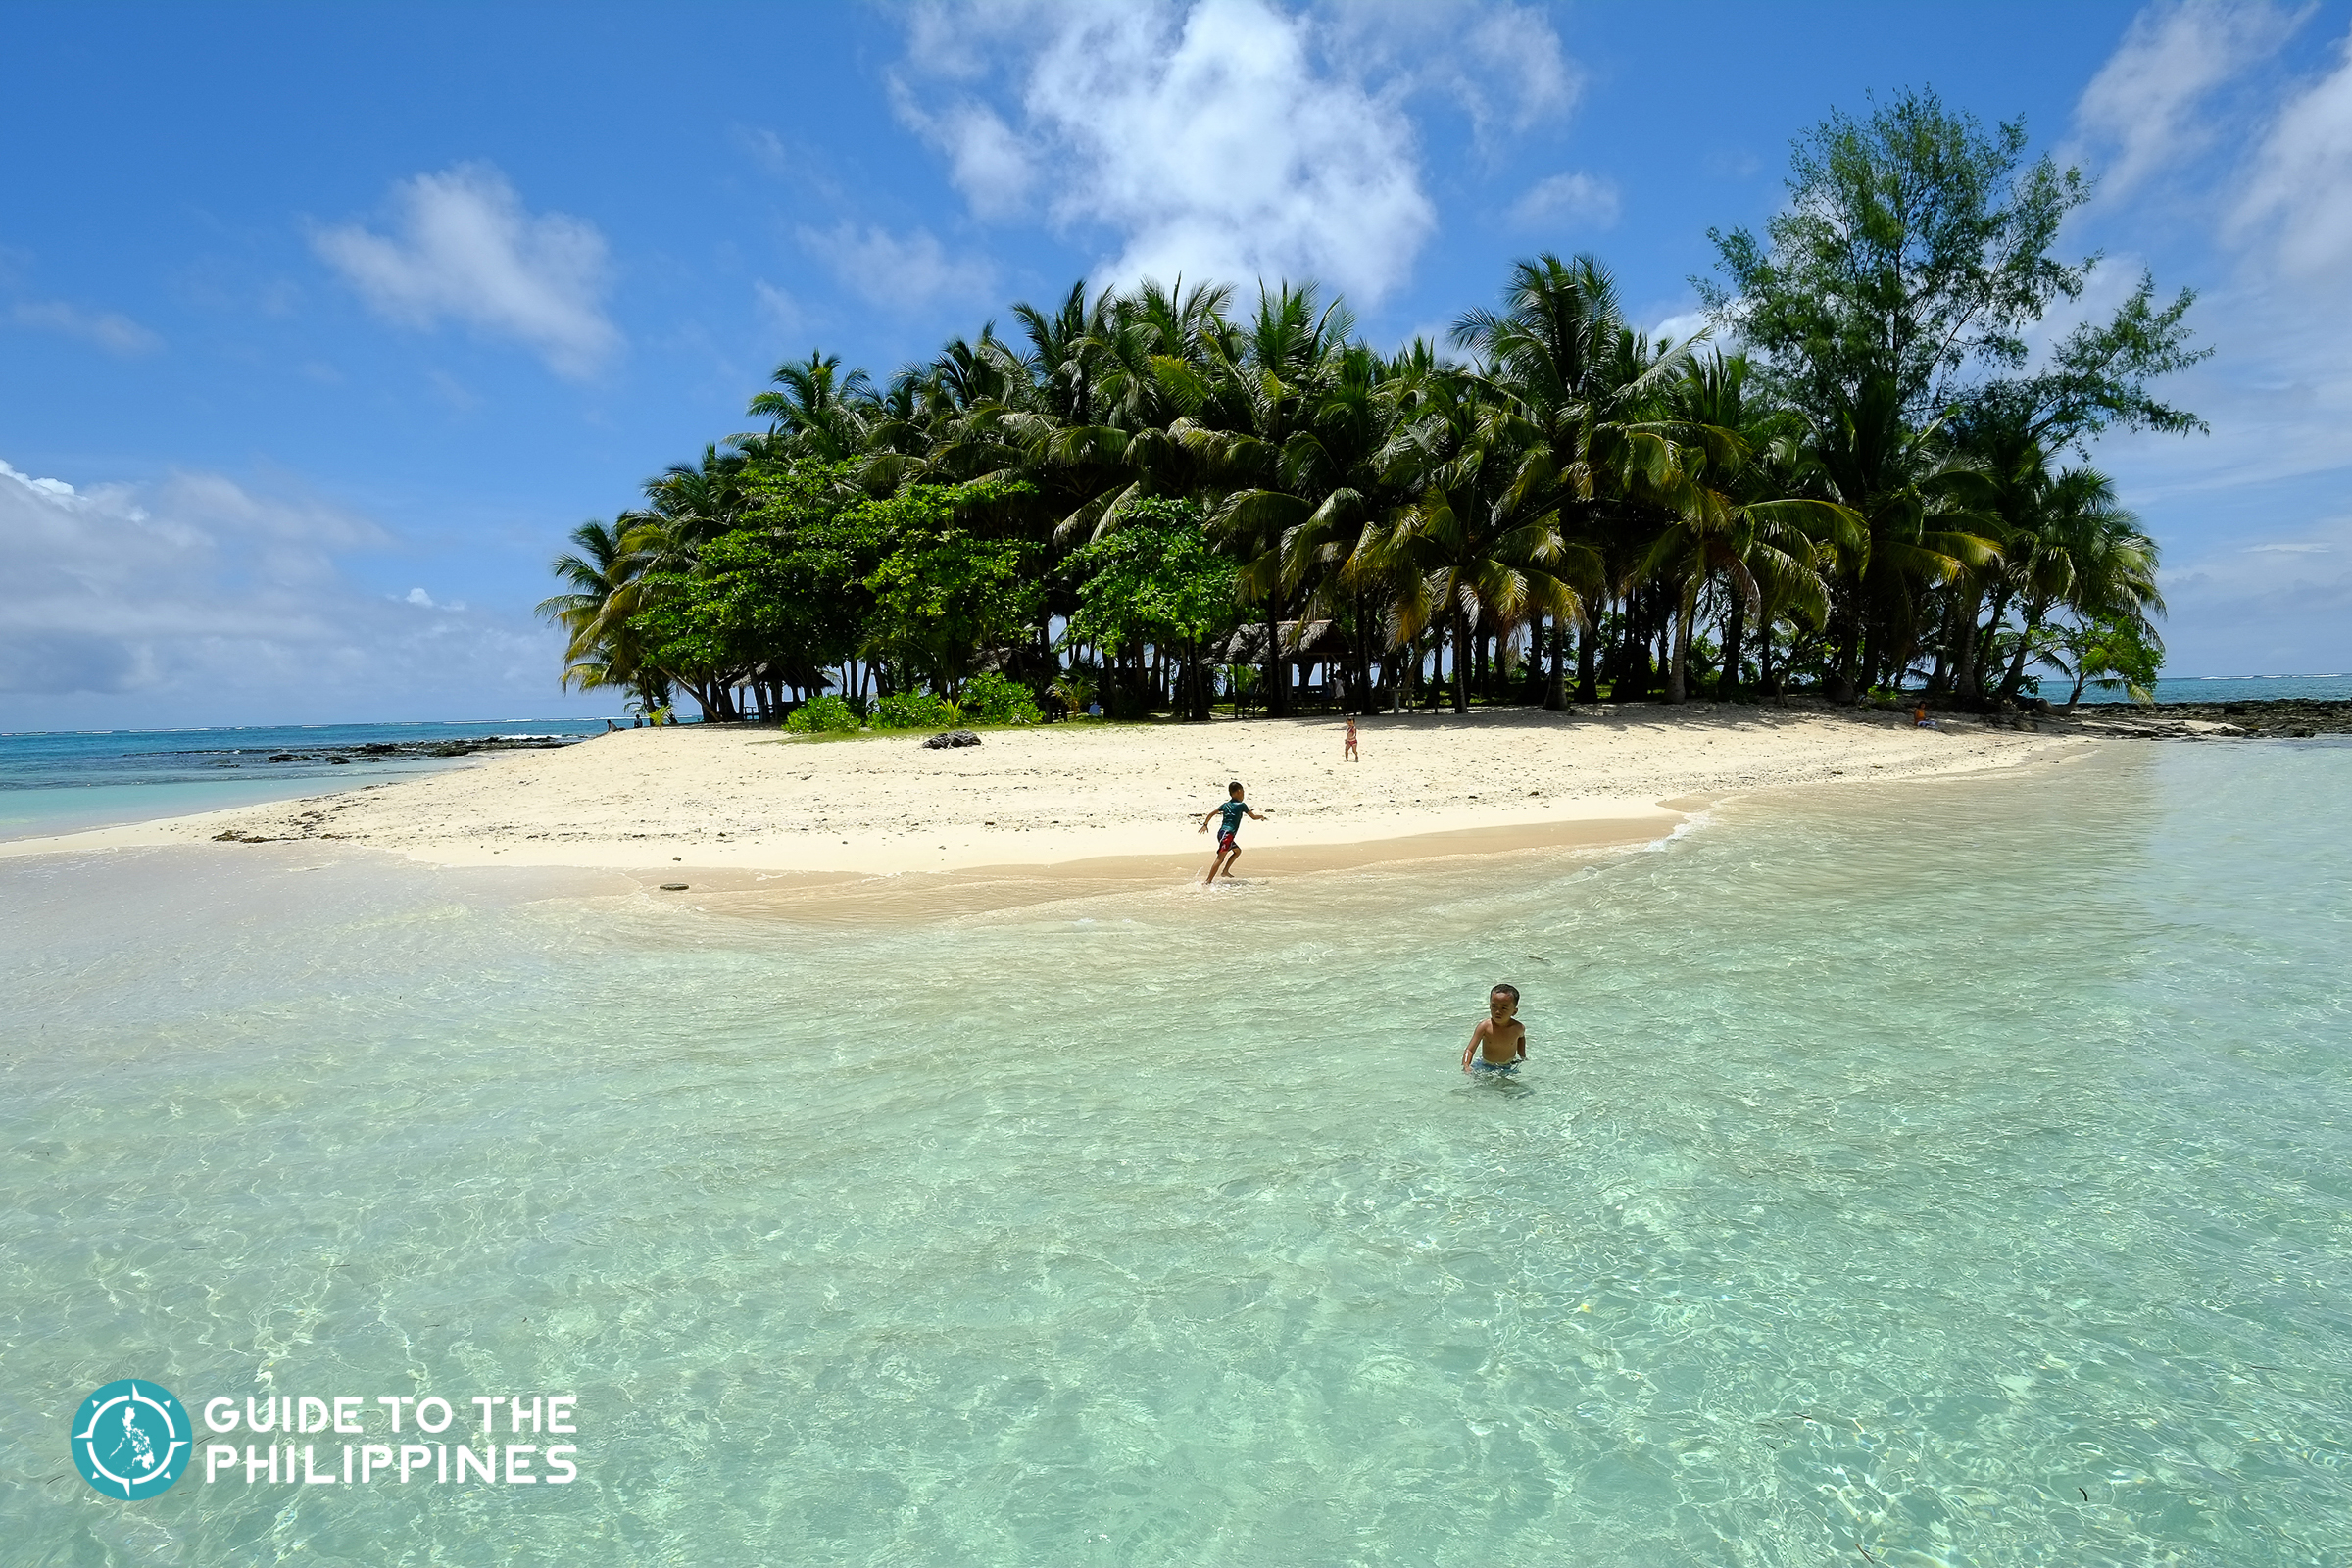 Siargao 7 Island Hopping Tour with Daku, Naked & Guyam Is